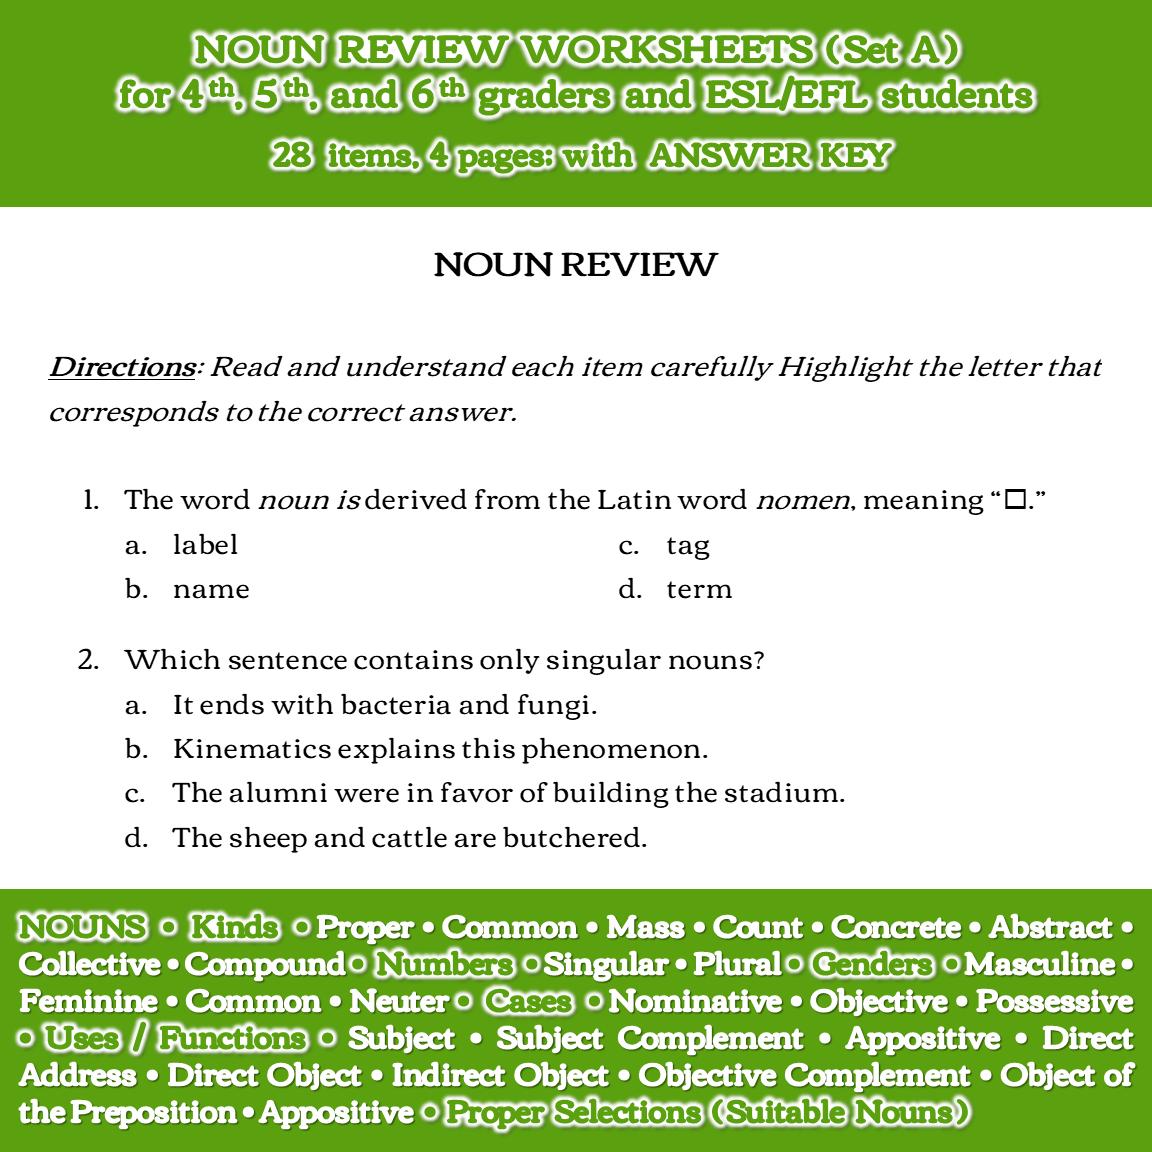 Noun Review Worksheets (Set A)